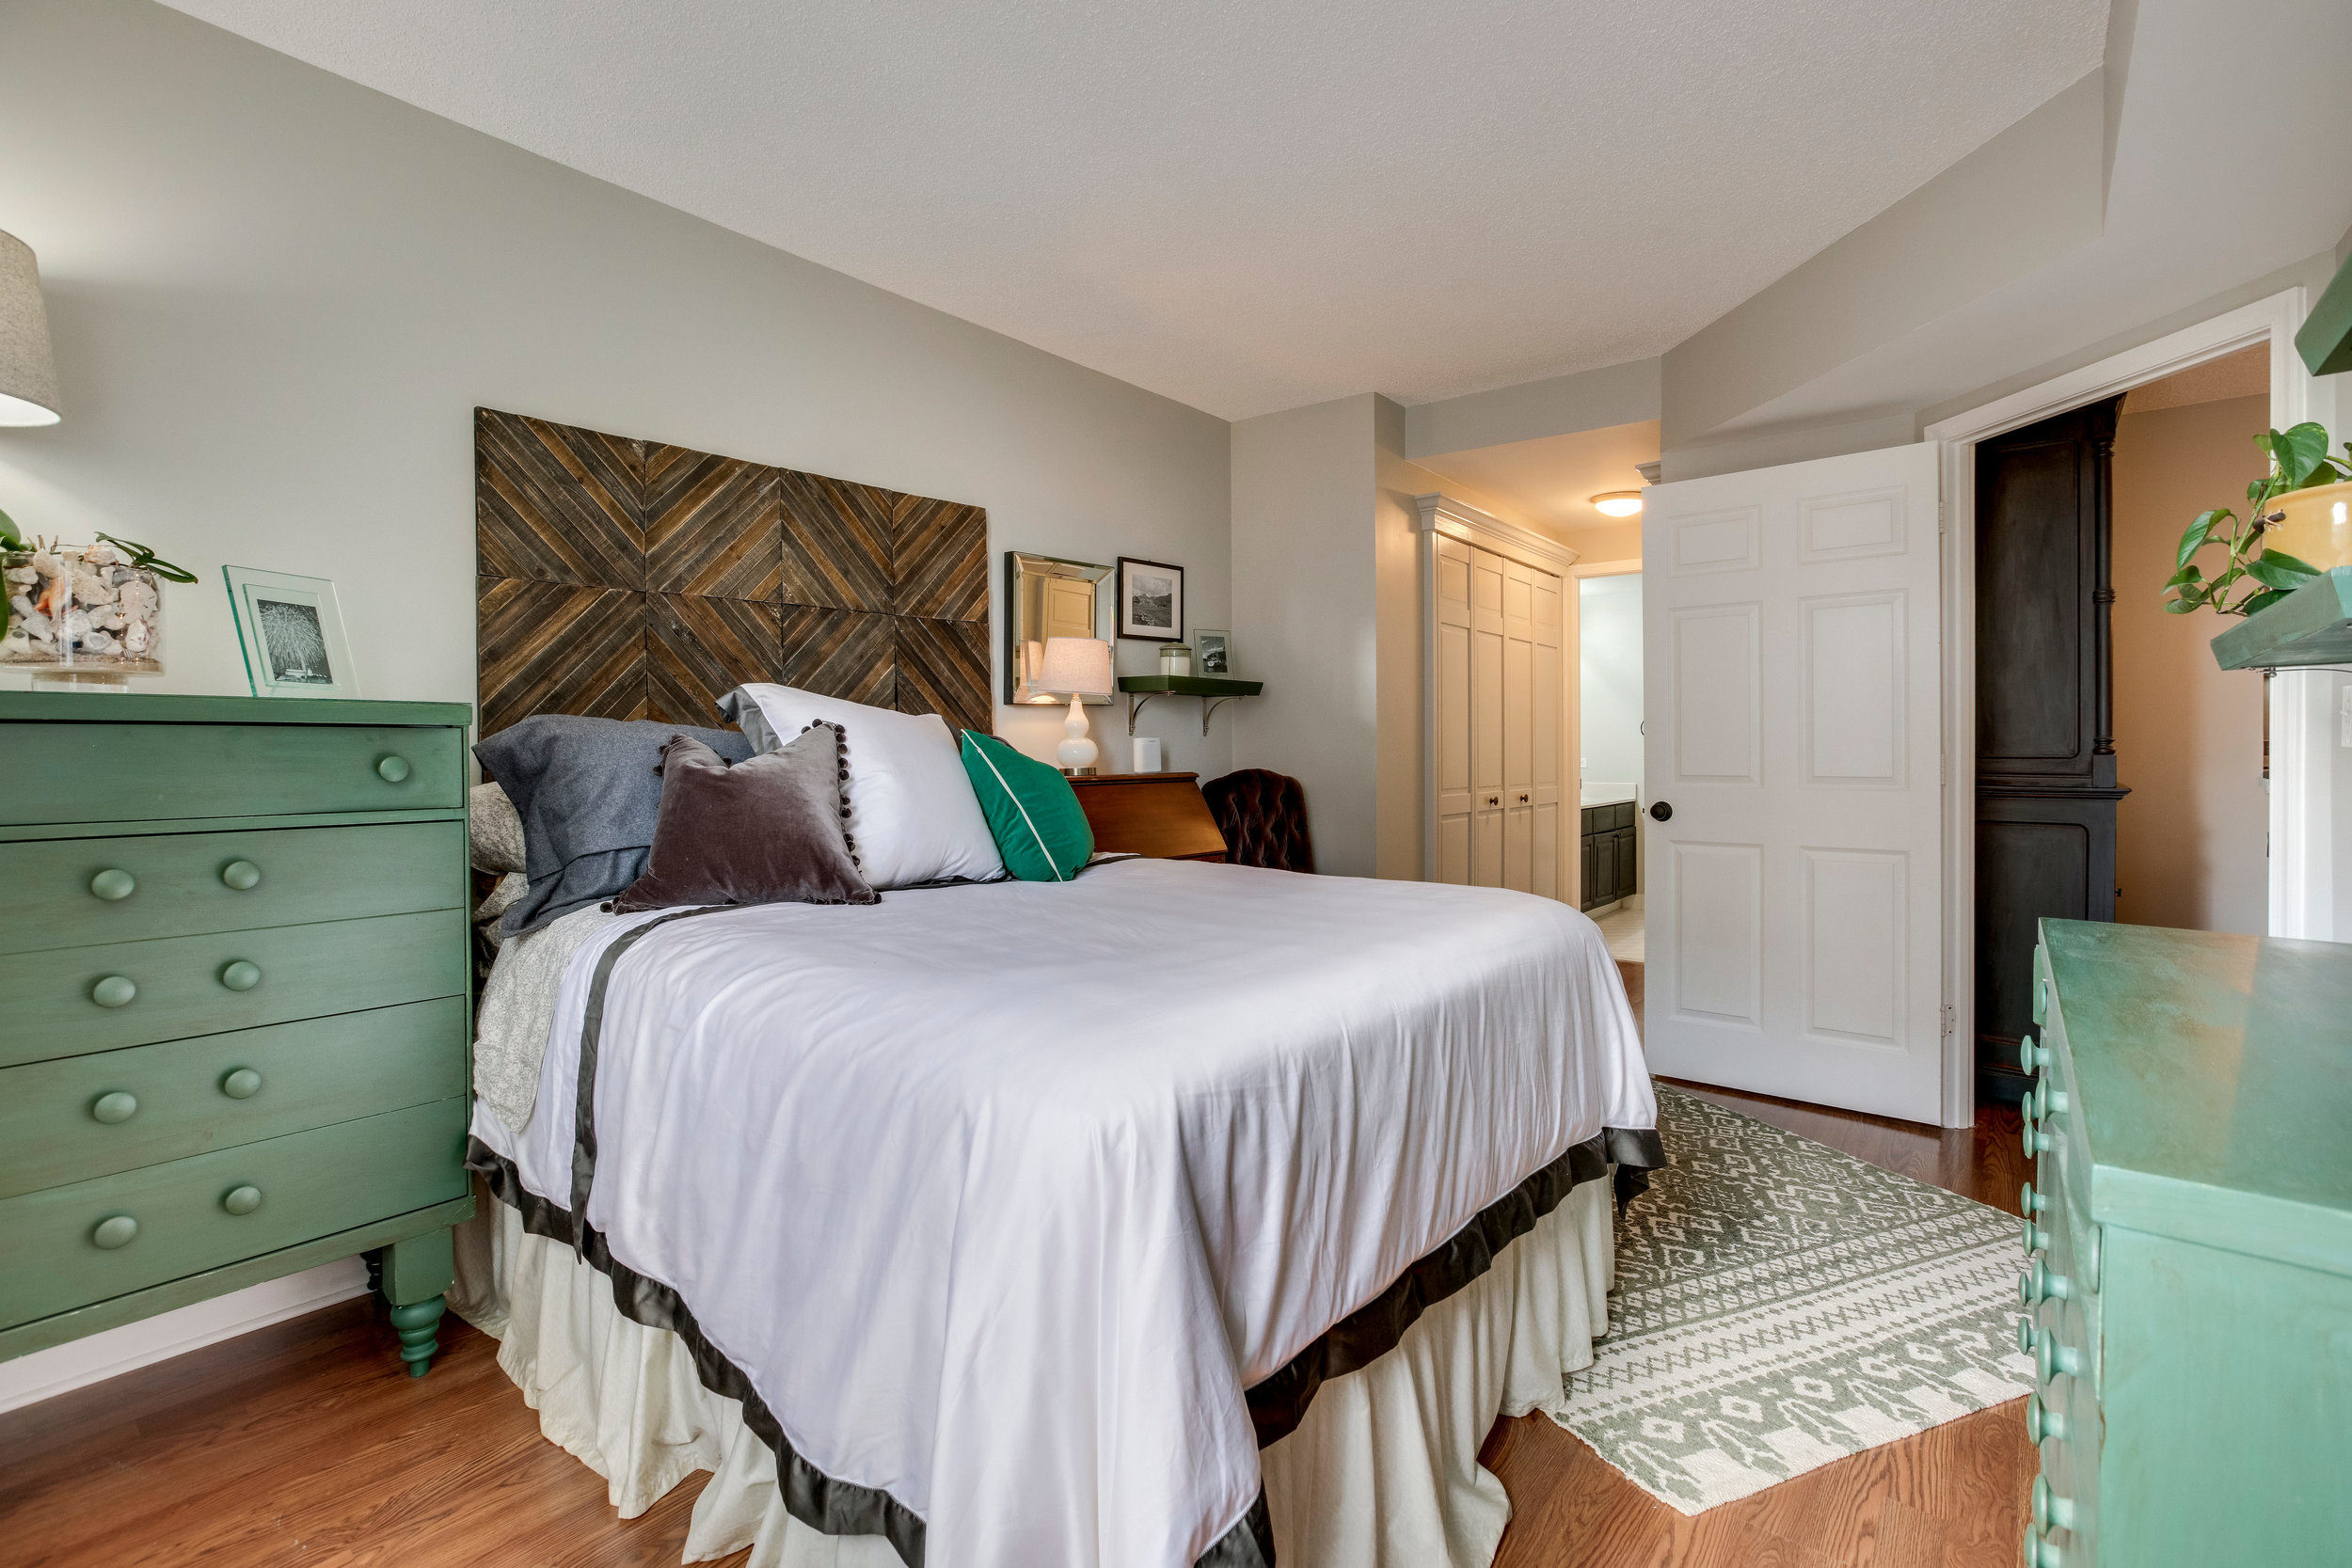 1050 N Taylor St 608 Arlington-print-048-48-Bedroom-4200x2800-300dpi.jpg